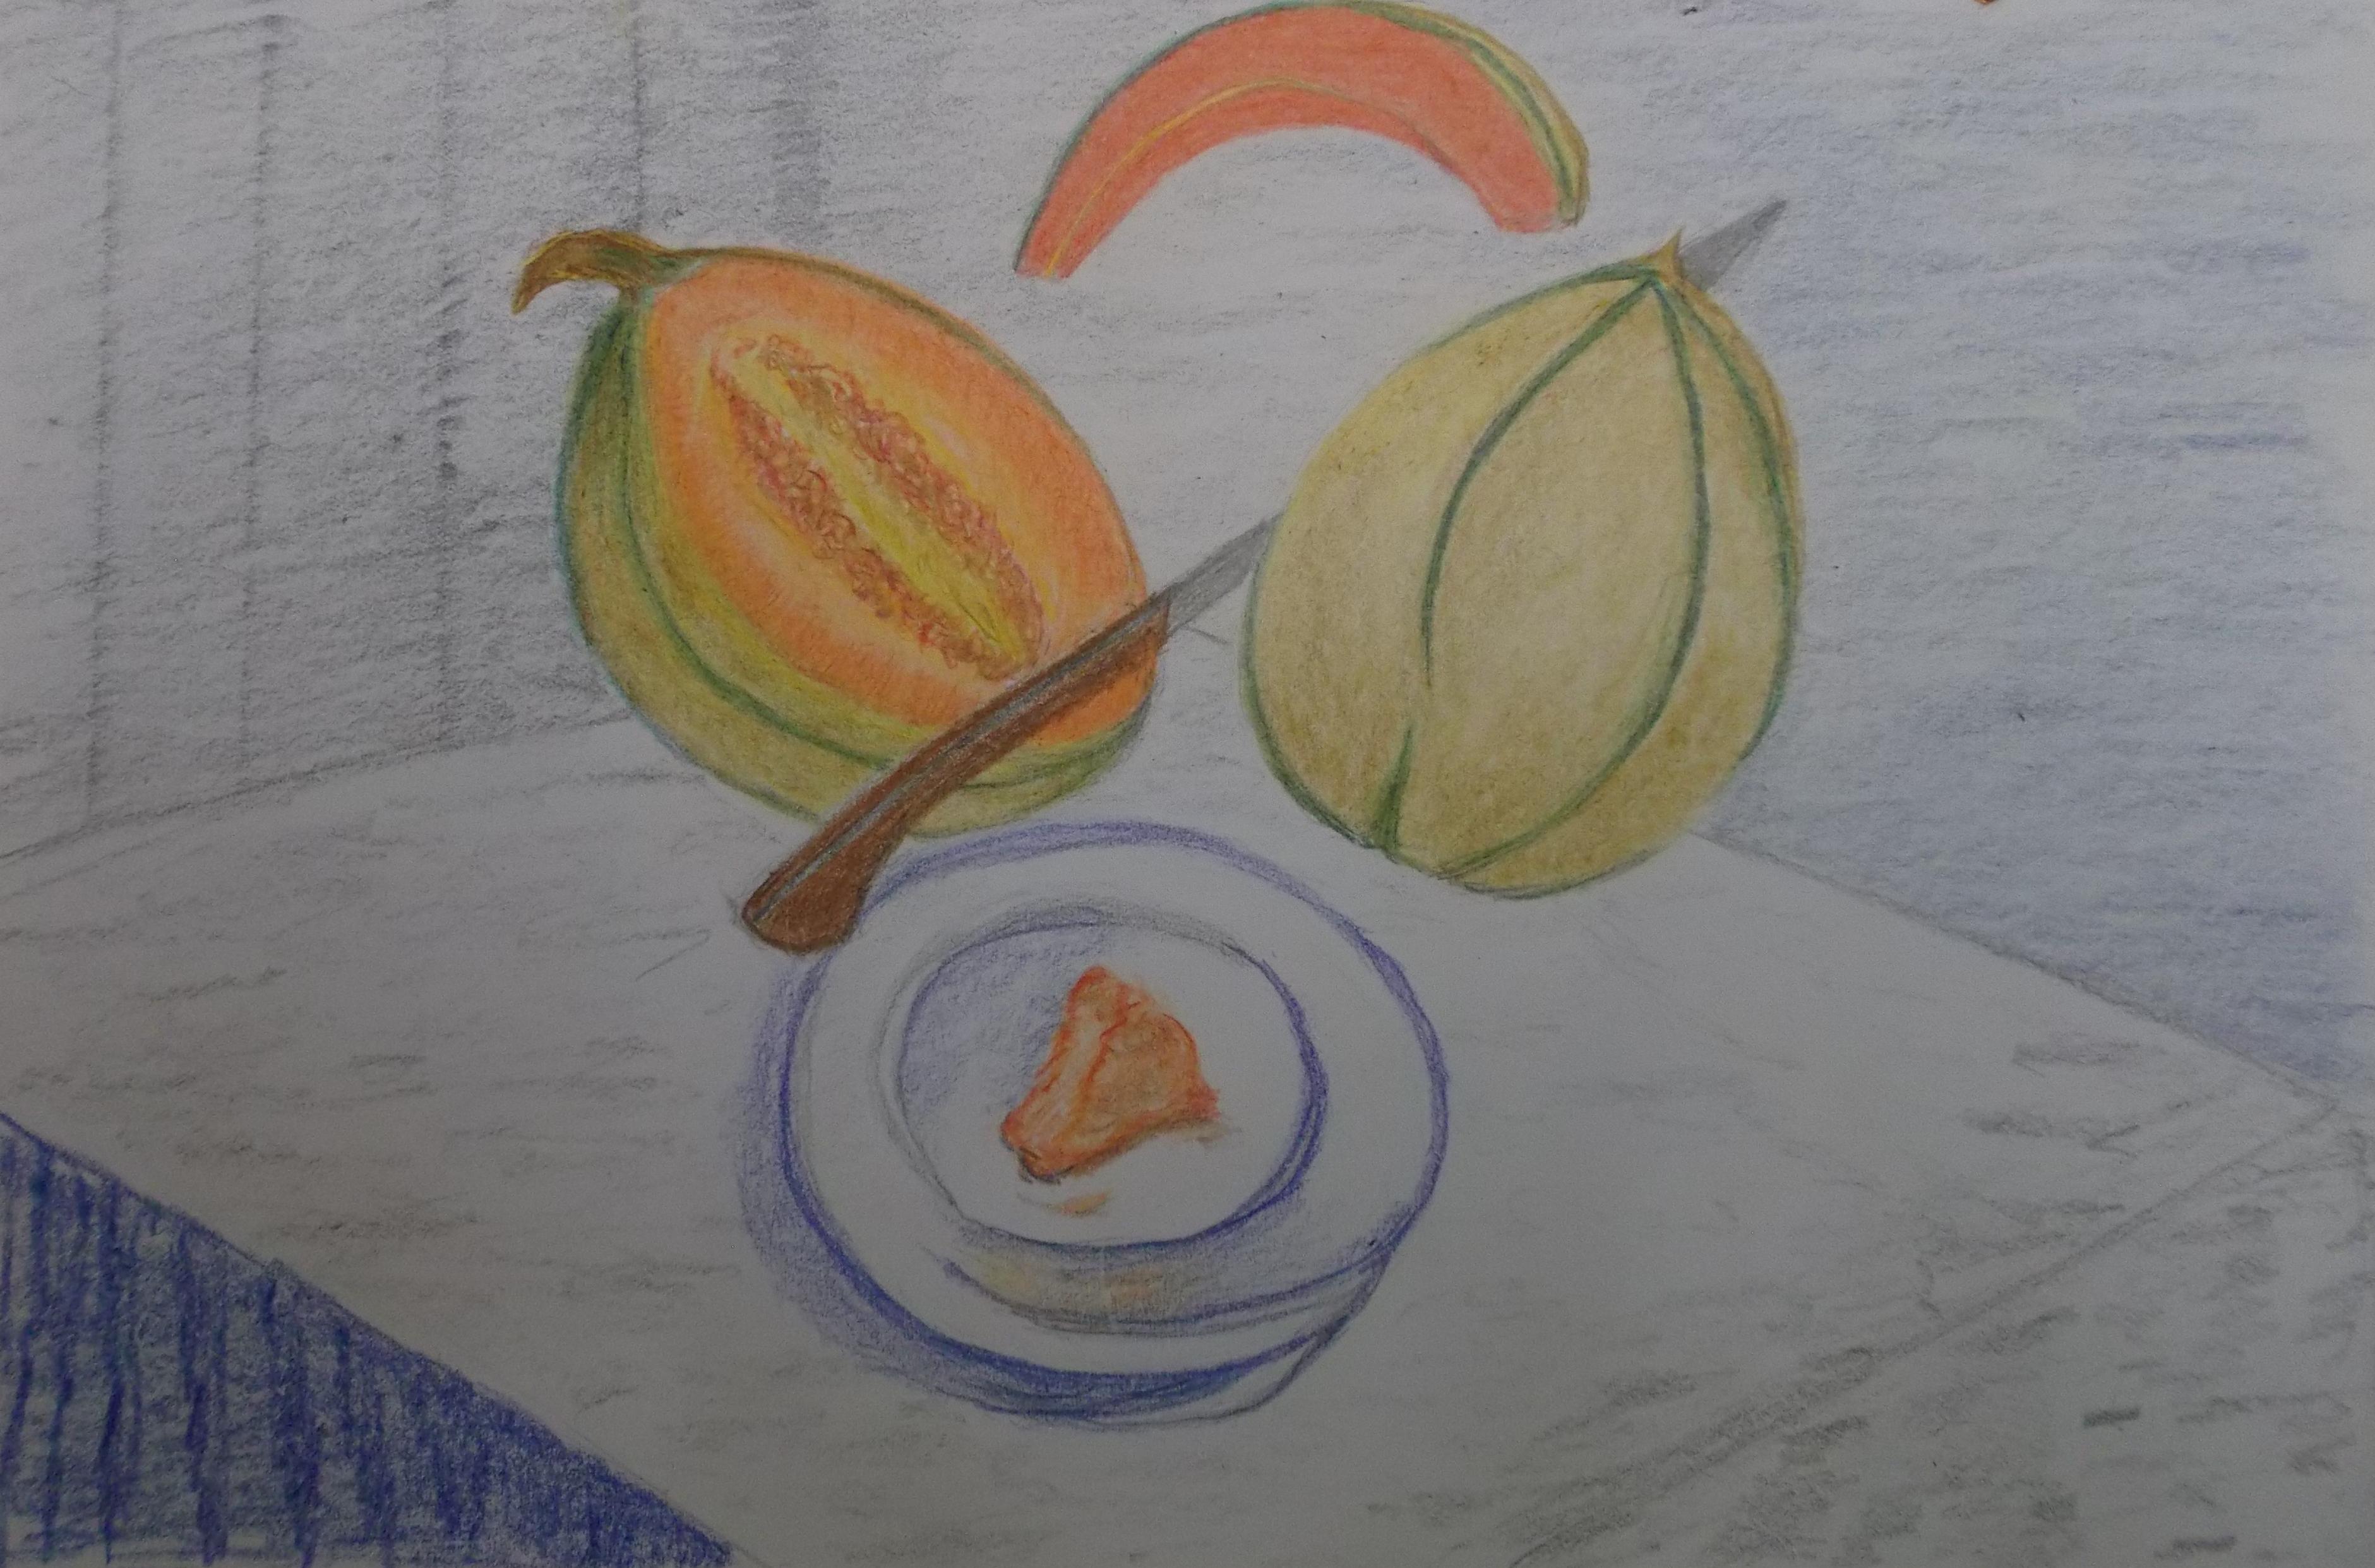 kleurpotlood op papier, 18 x 25 cm